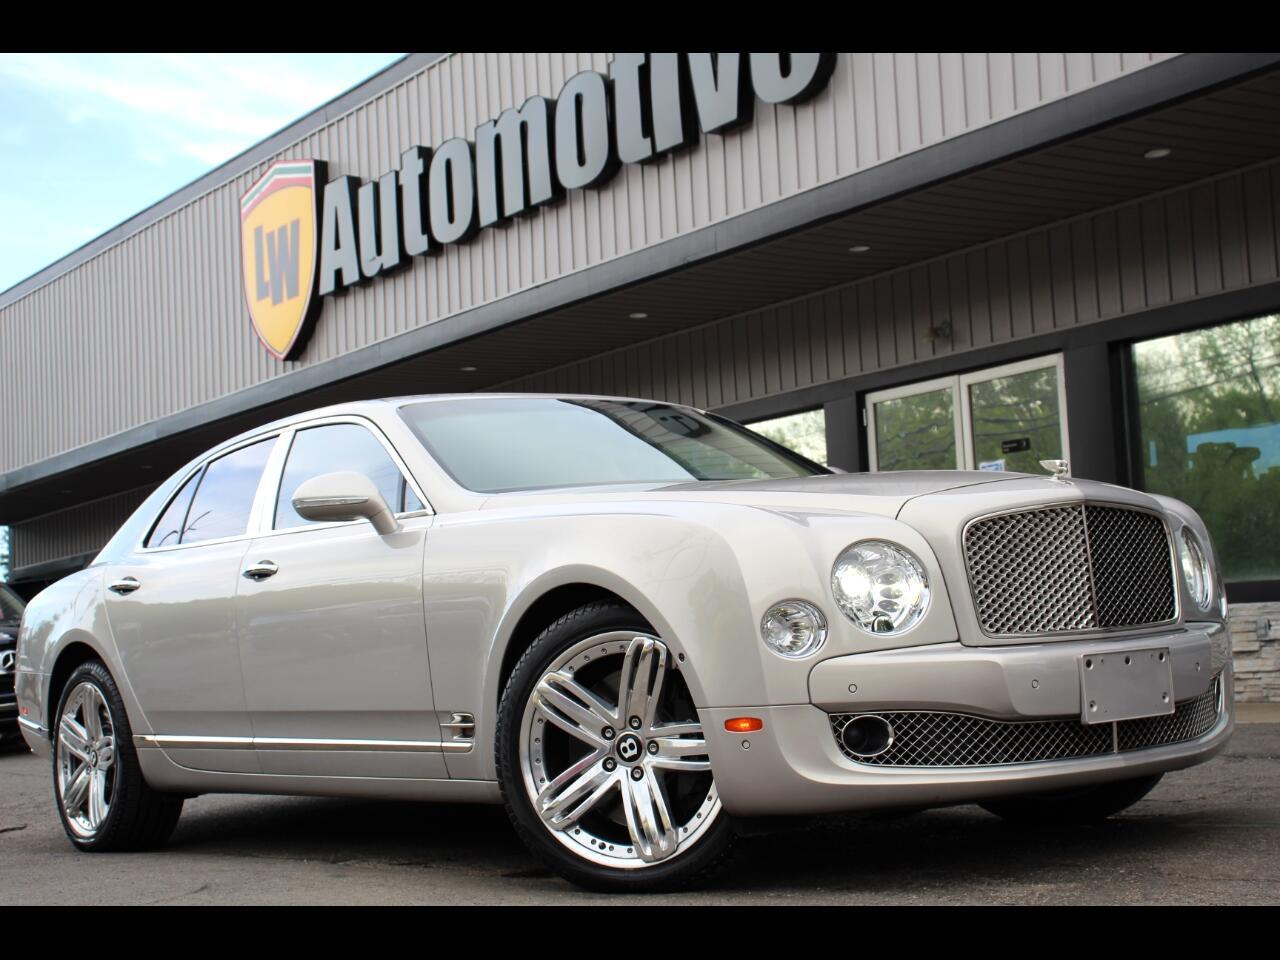 Bentley Mulsanne 4dr Sdn 2014